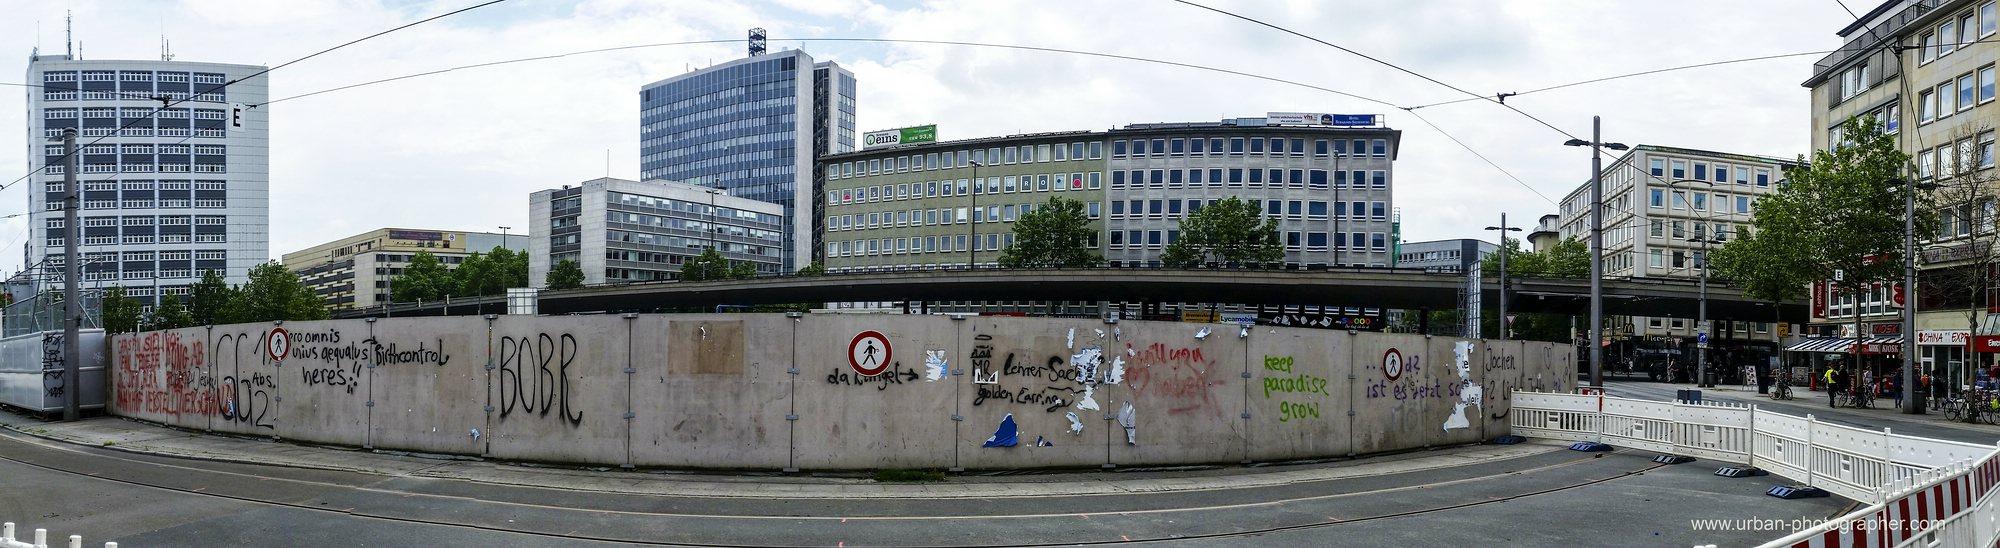 Baustelle Bahnhofsplatz 53